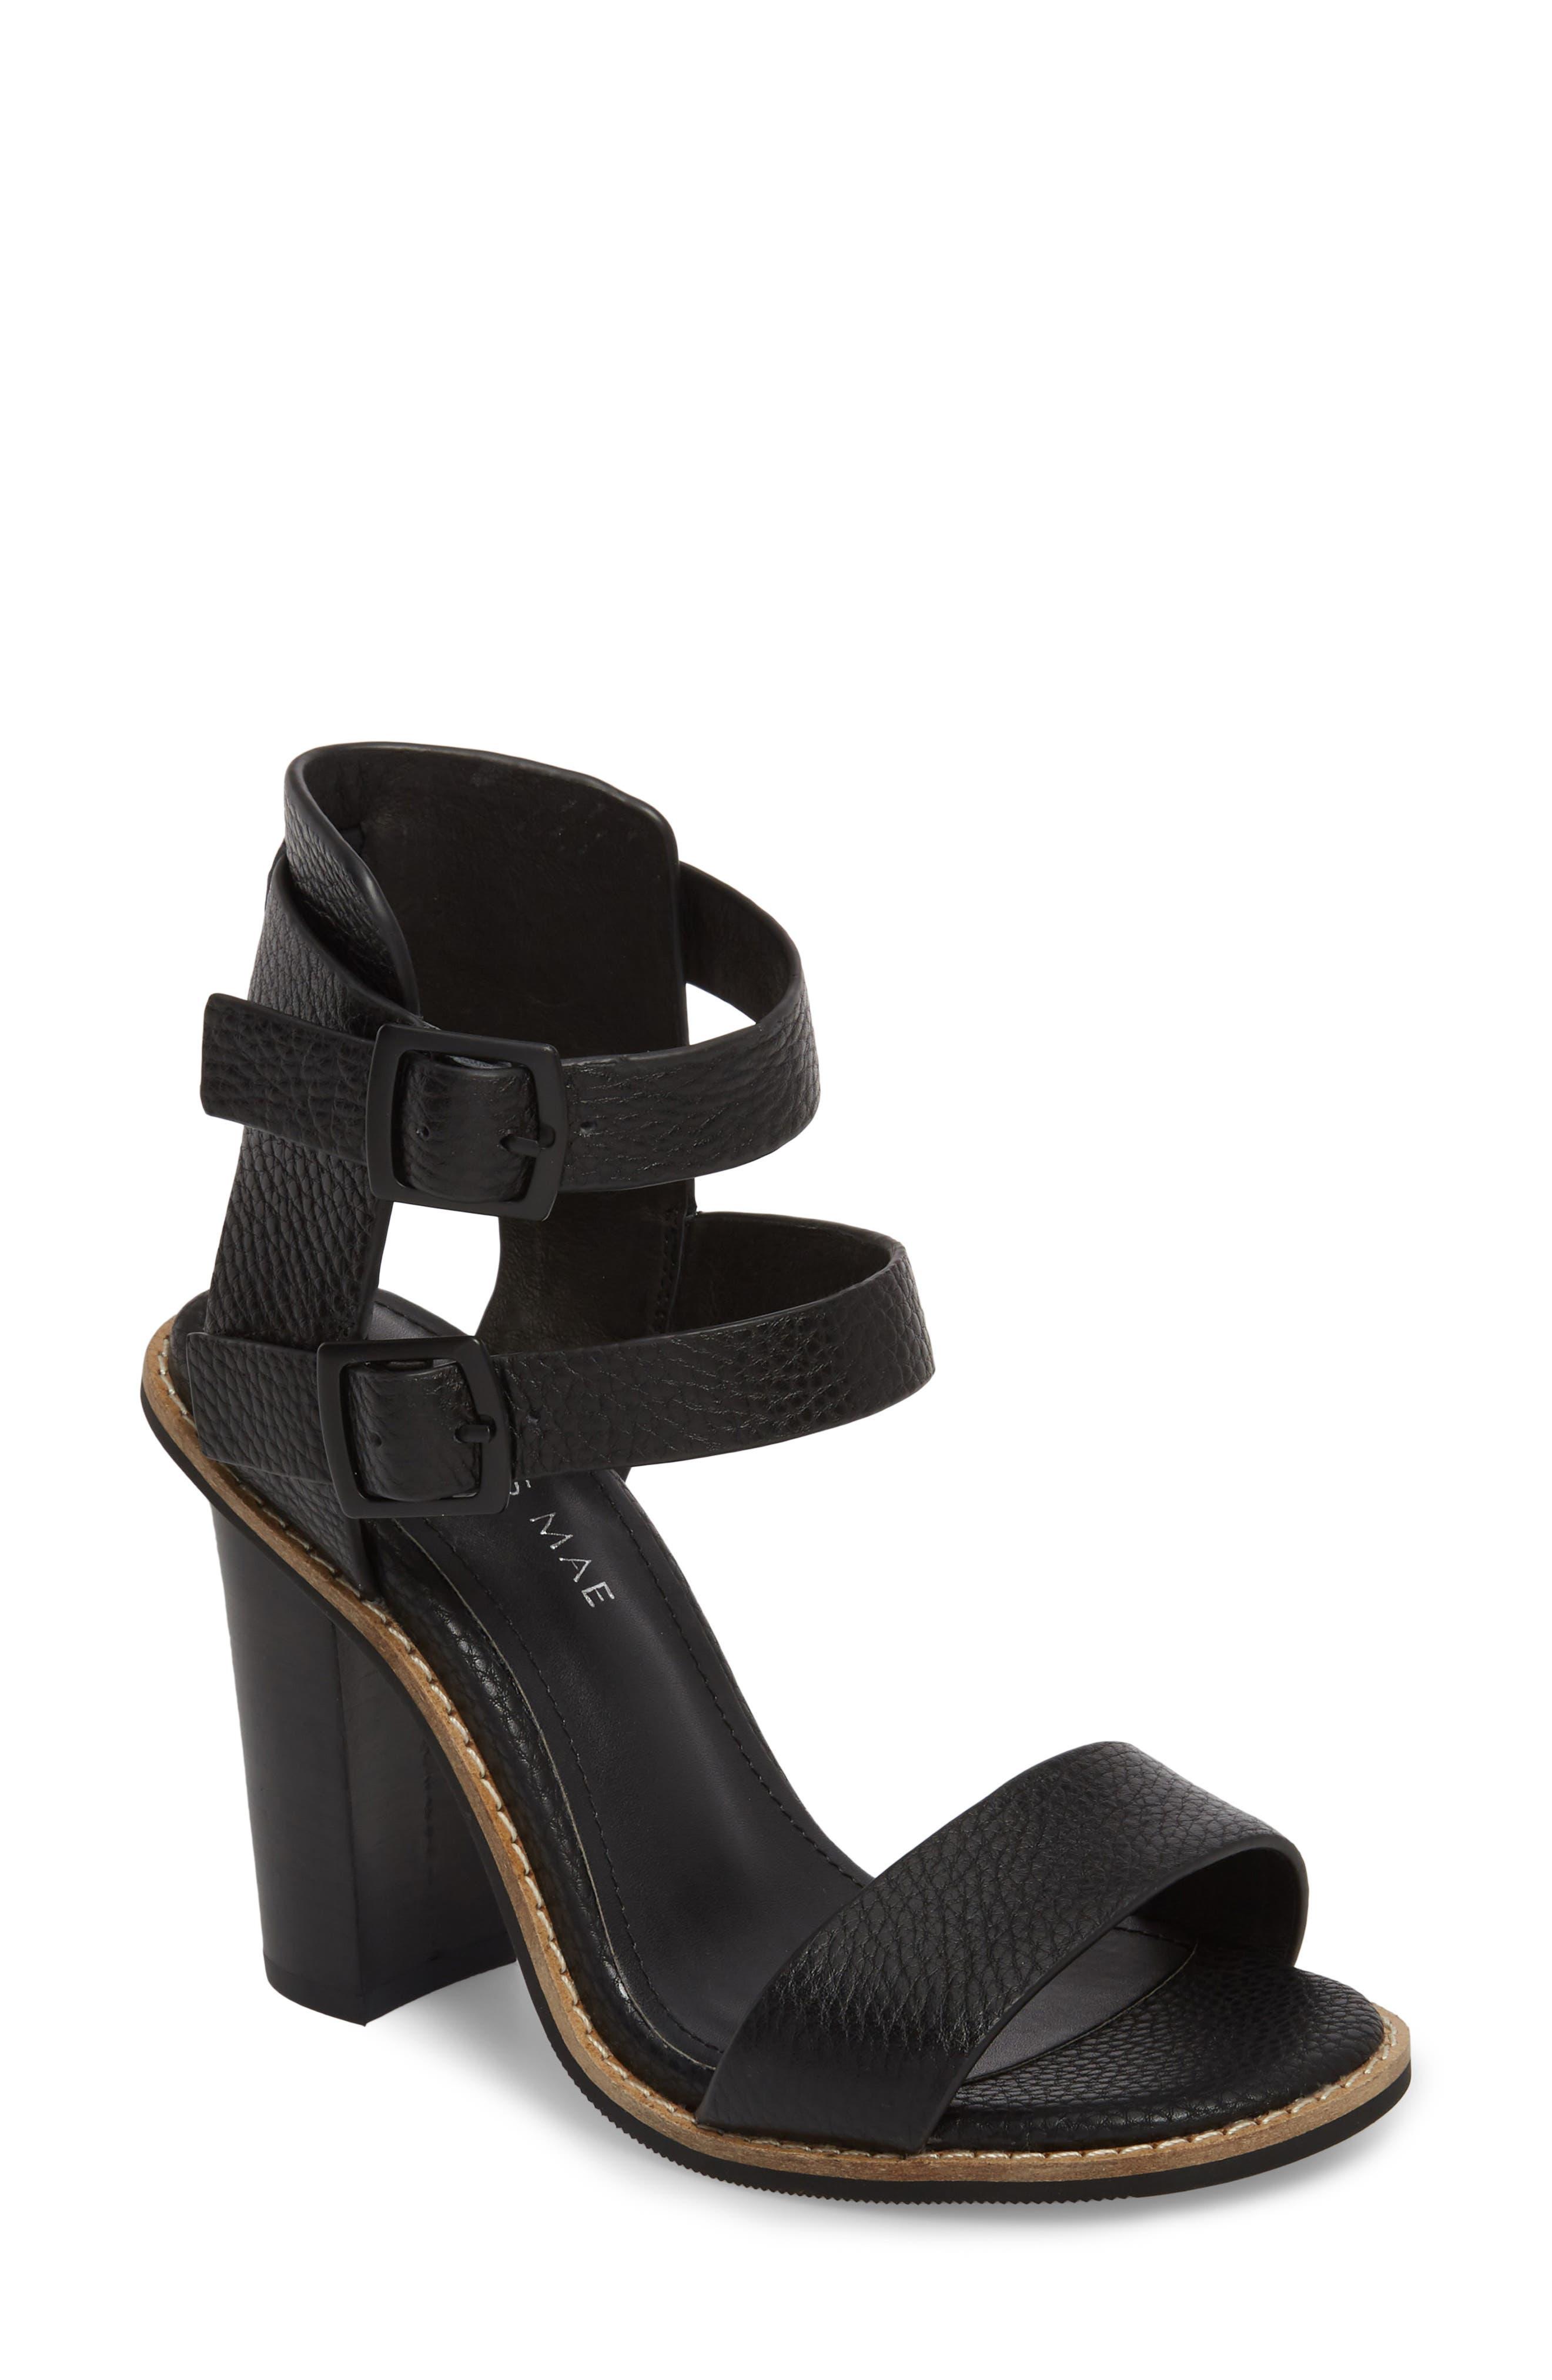 Casper Tall Sandal,                         Main,                         color, Black Leather